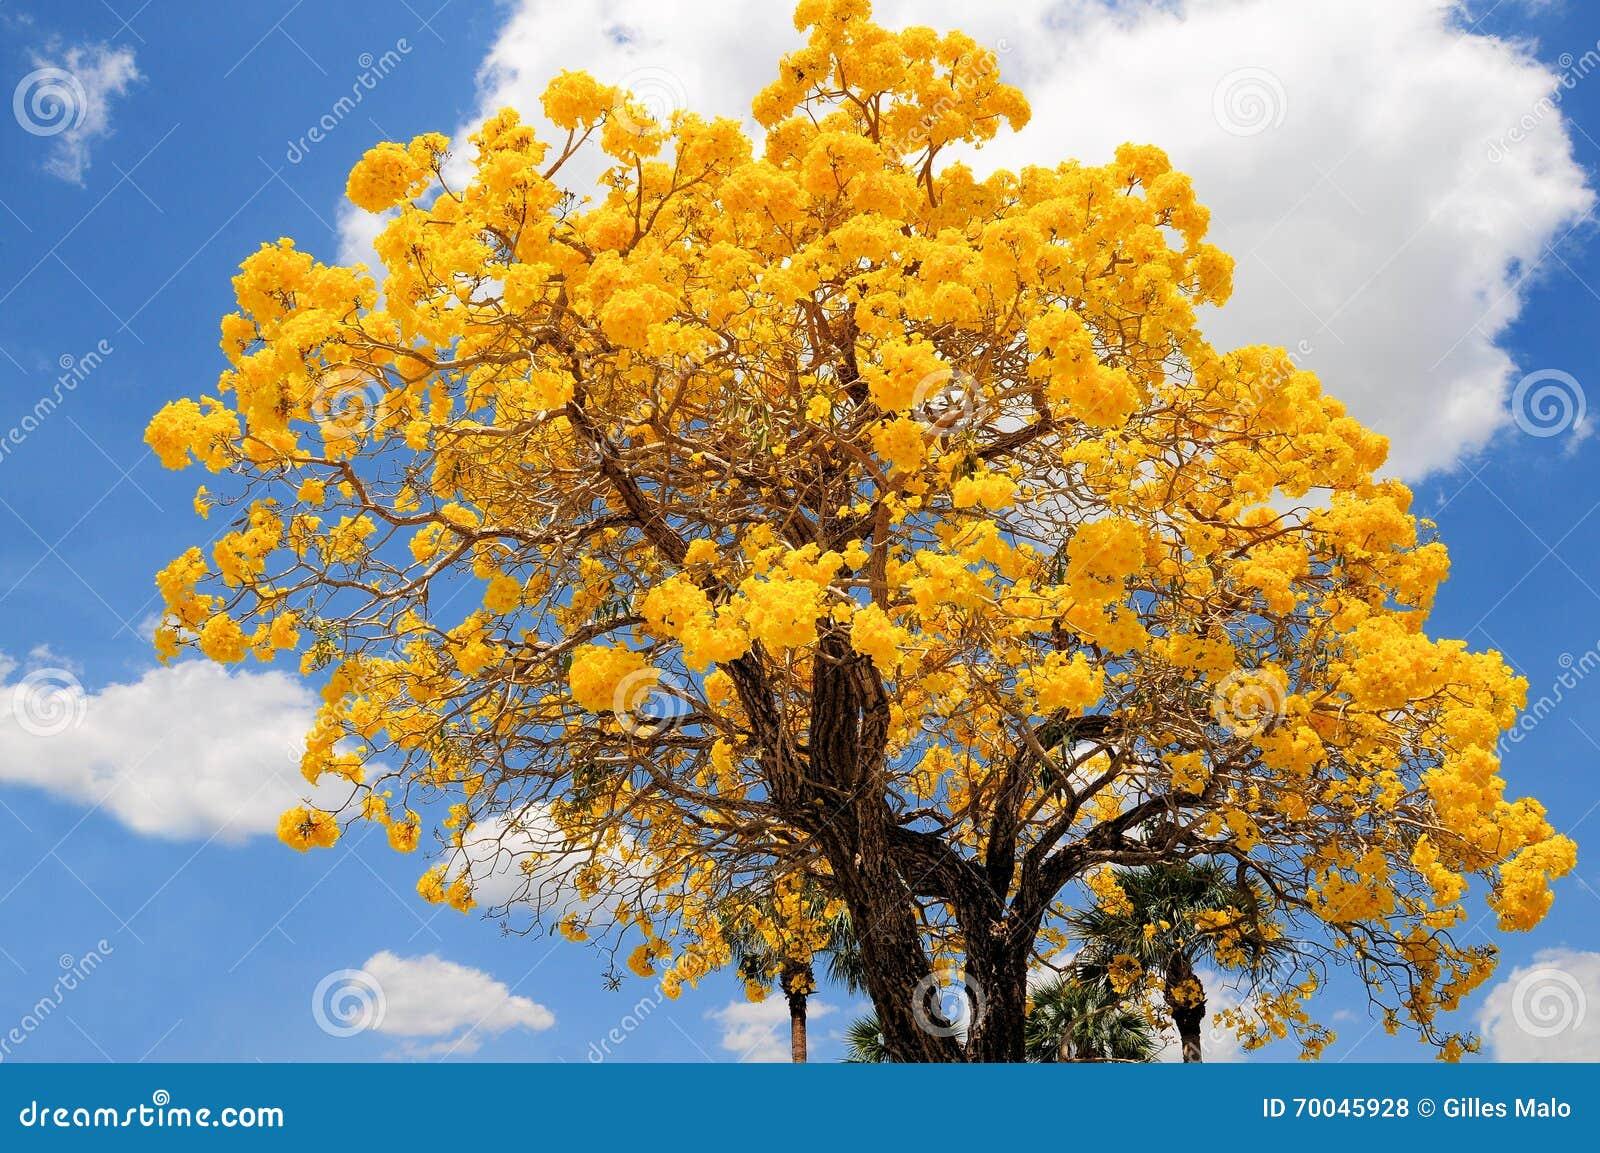 Tabebuia Aurea Tree In Full Bloom Florida Stock Photo Image Of